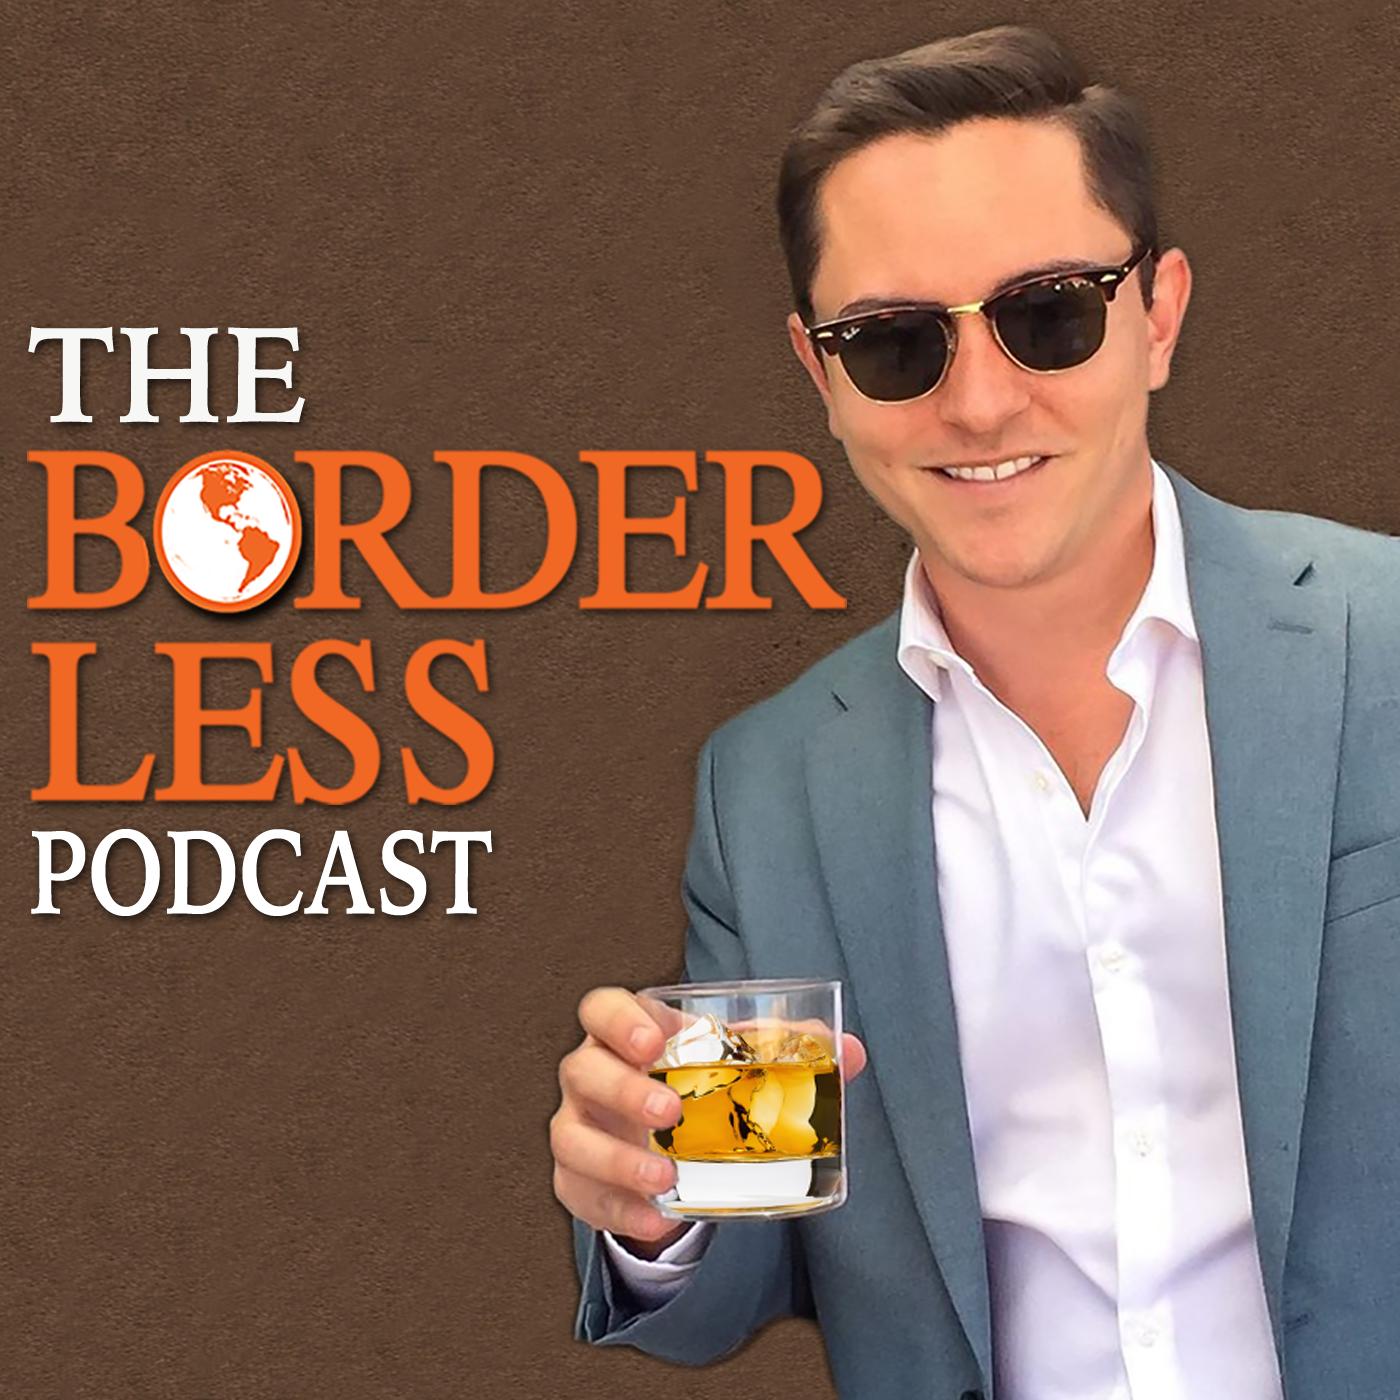 Borderless Podcast show image